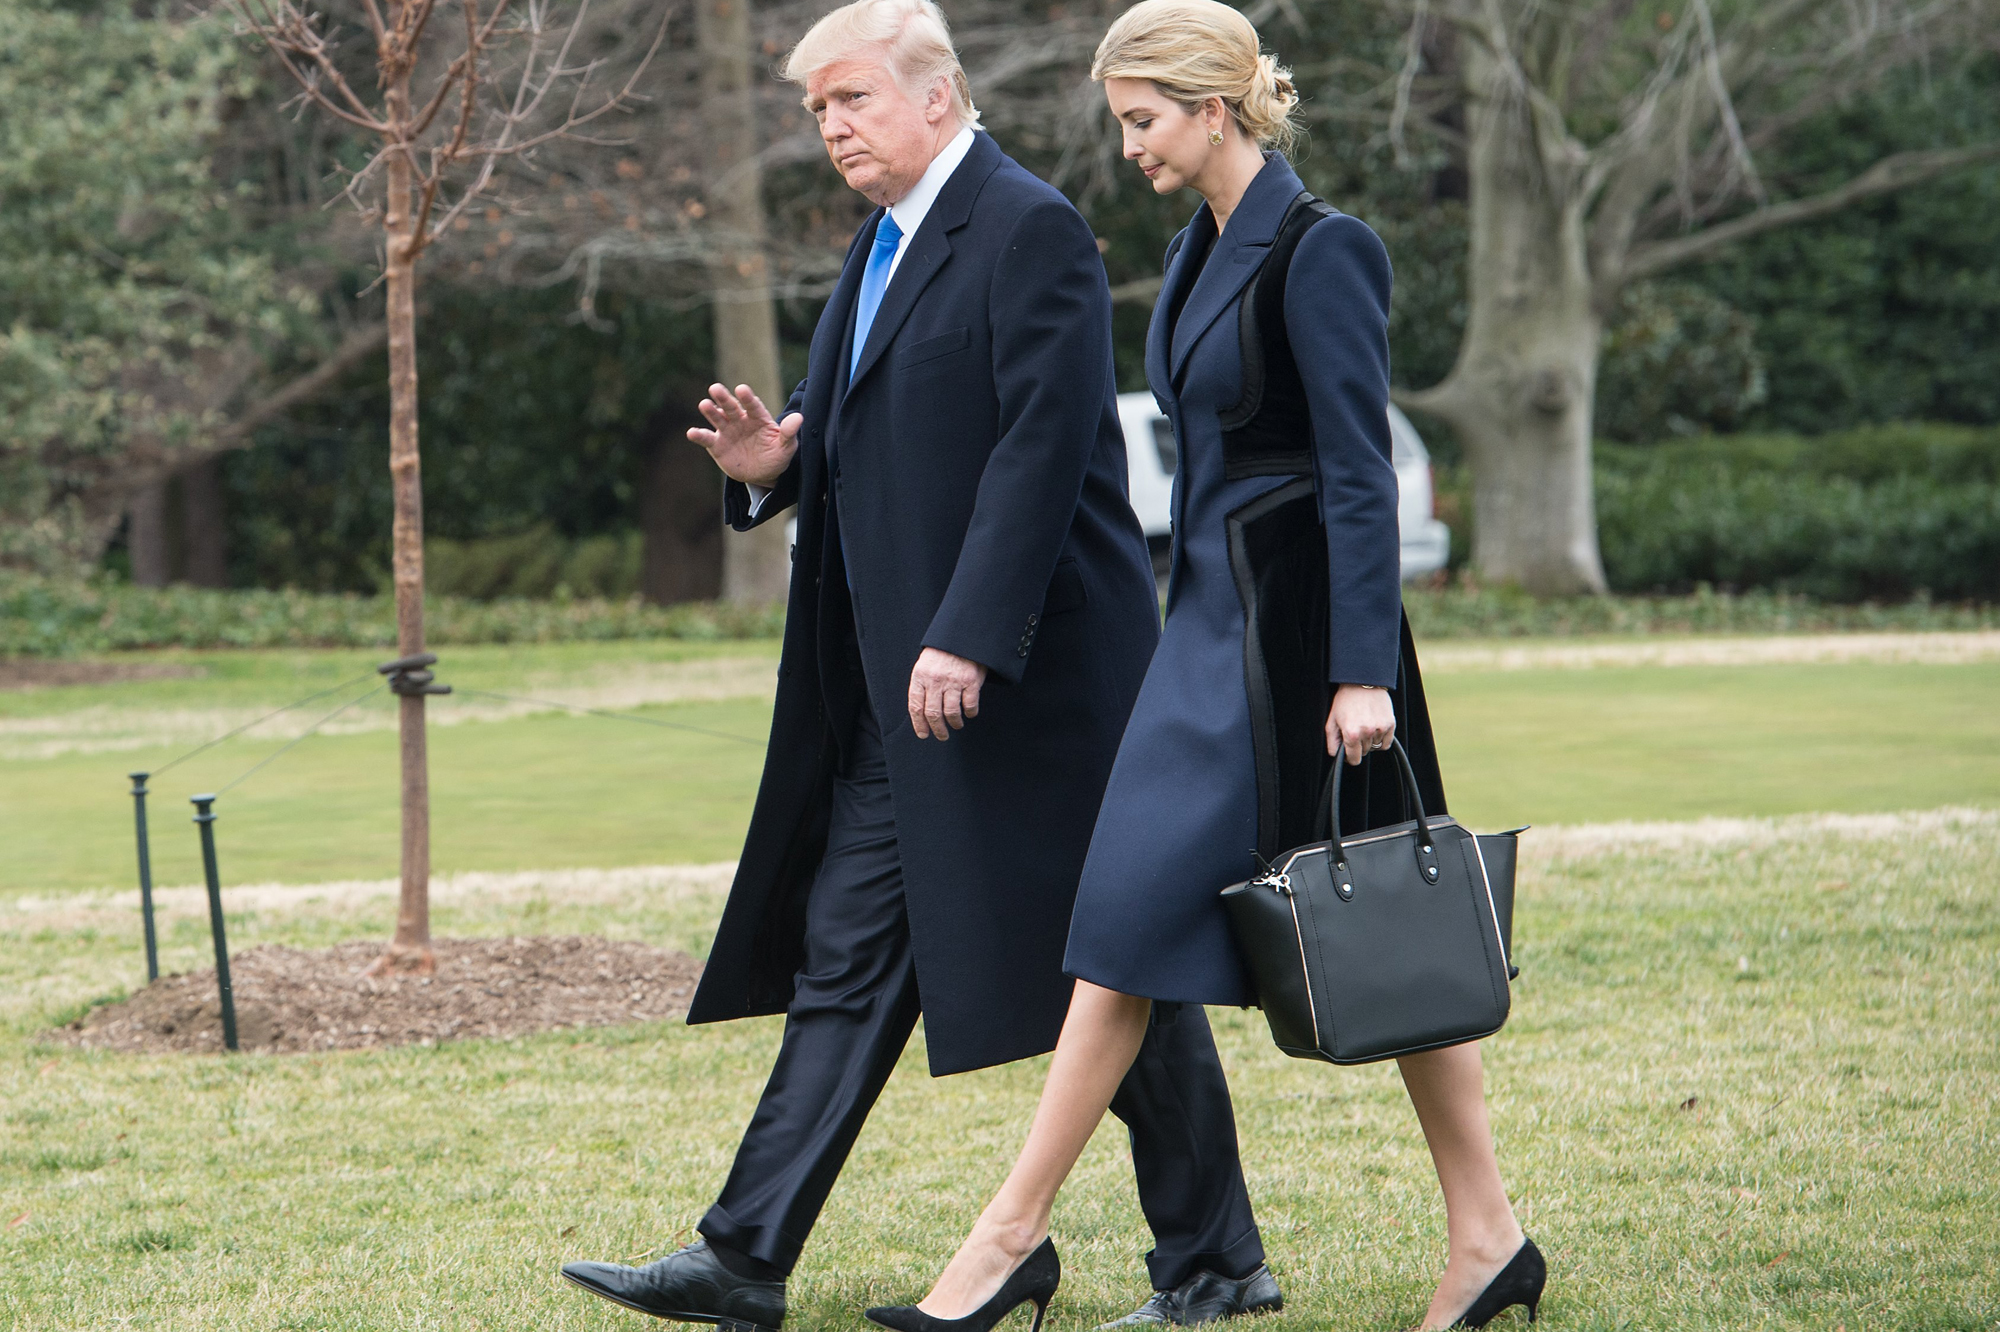 Donald trump ivanka trump maison blanche jpg trump